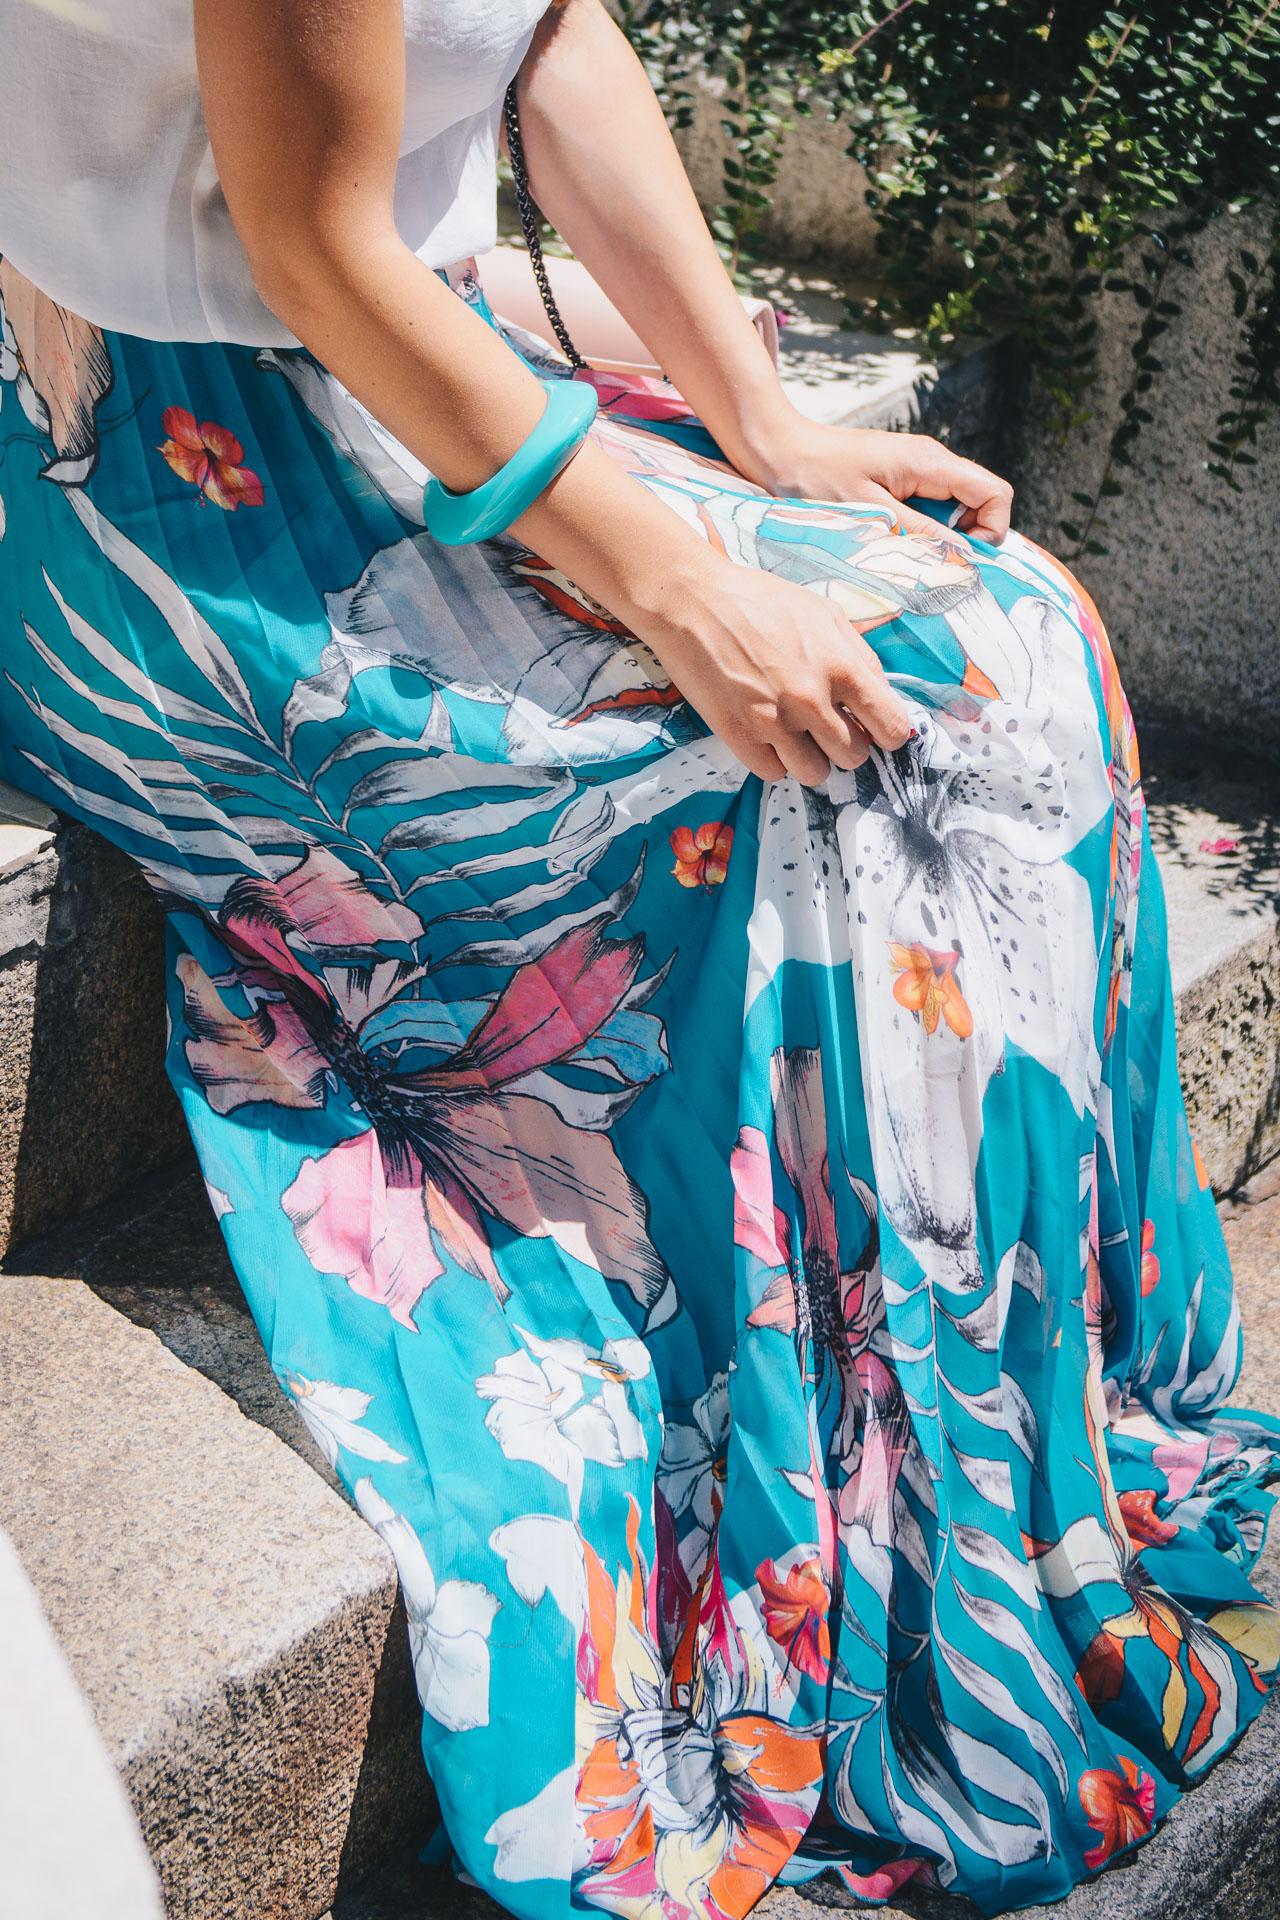 Floral skirt 05072017